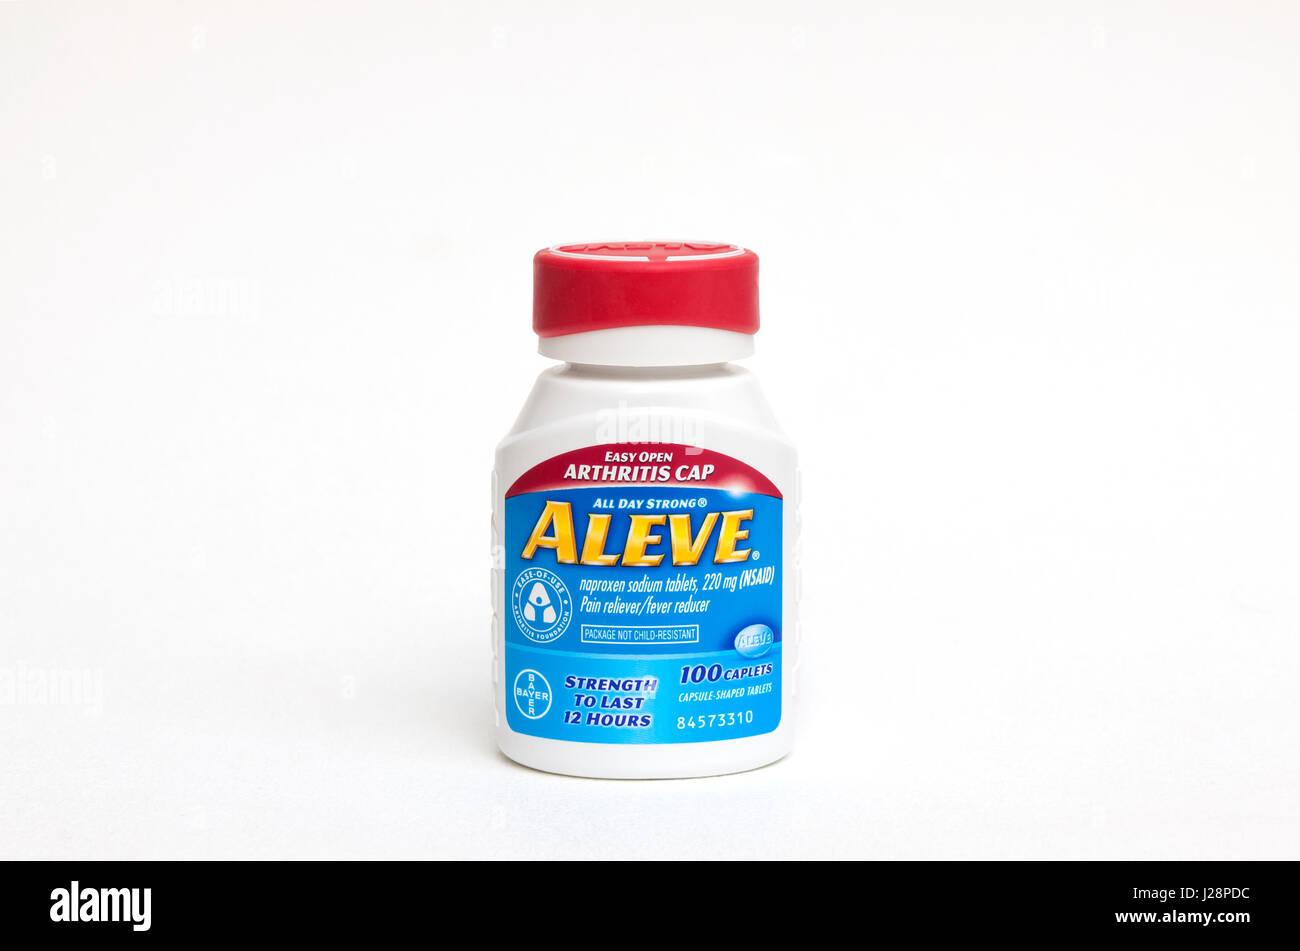 Aleve (naproxen sodium), popular name brand, bottle with easy open arthritis cap. - Stock Image